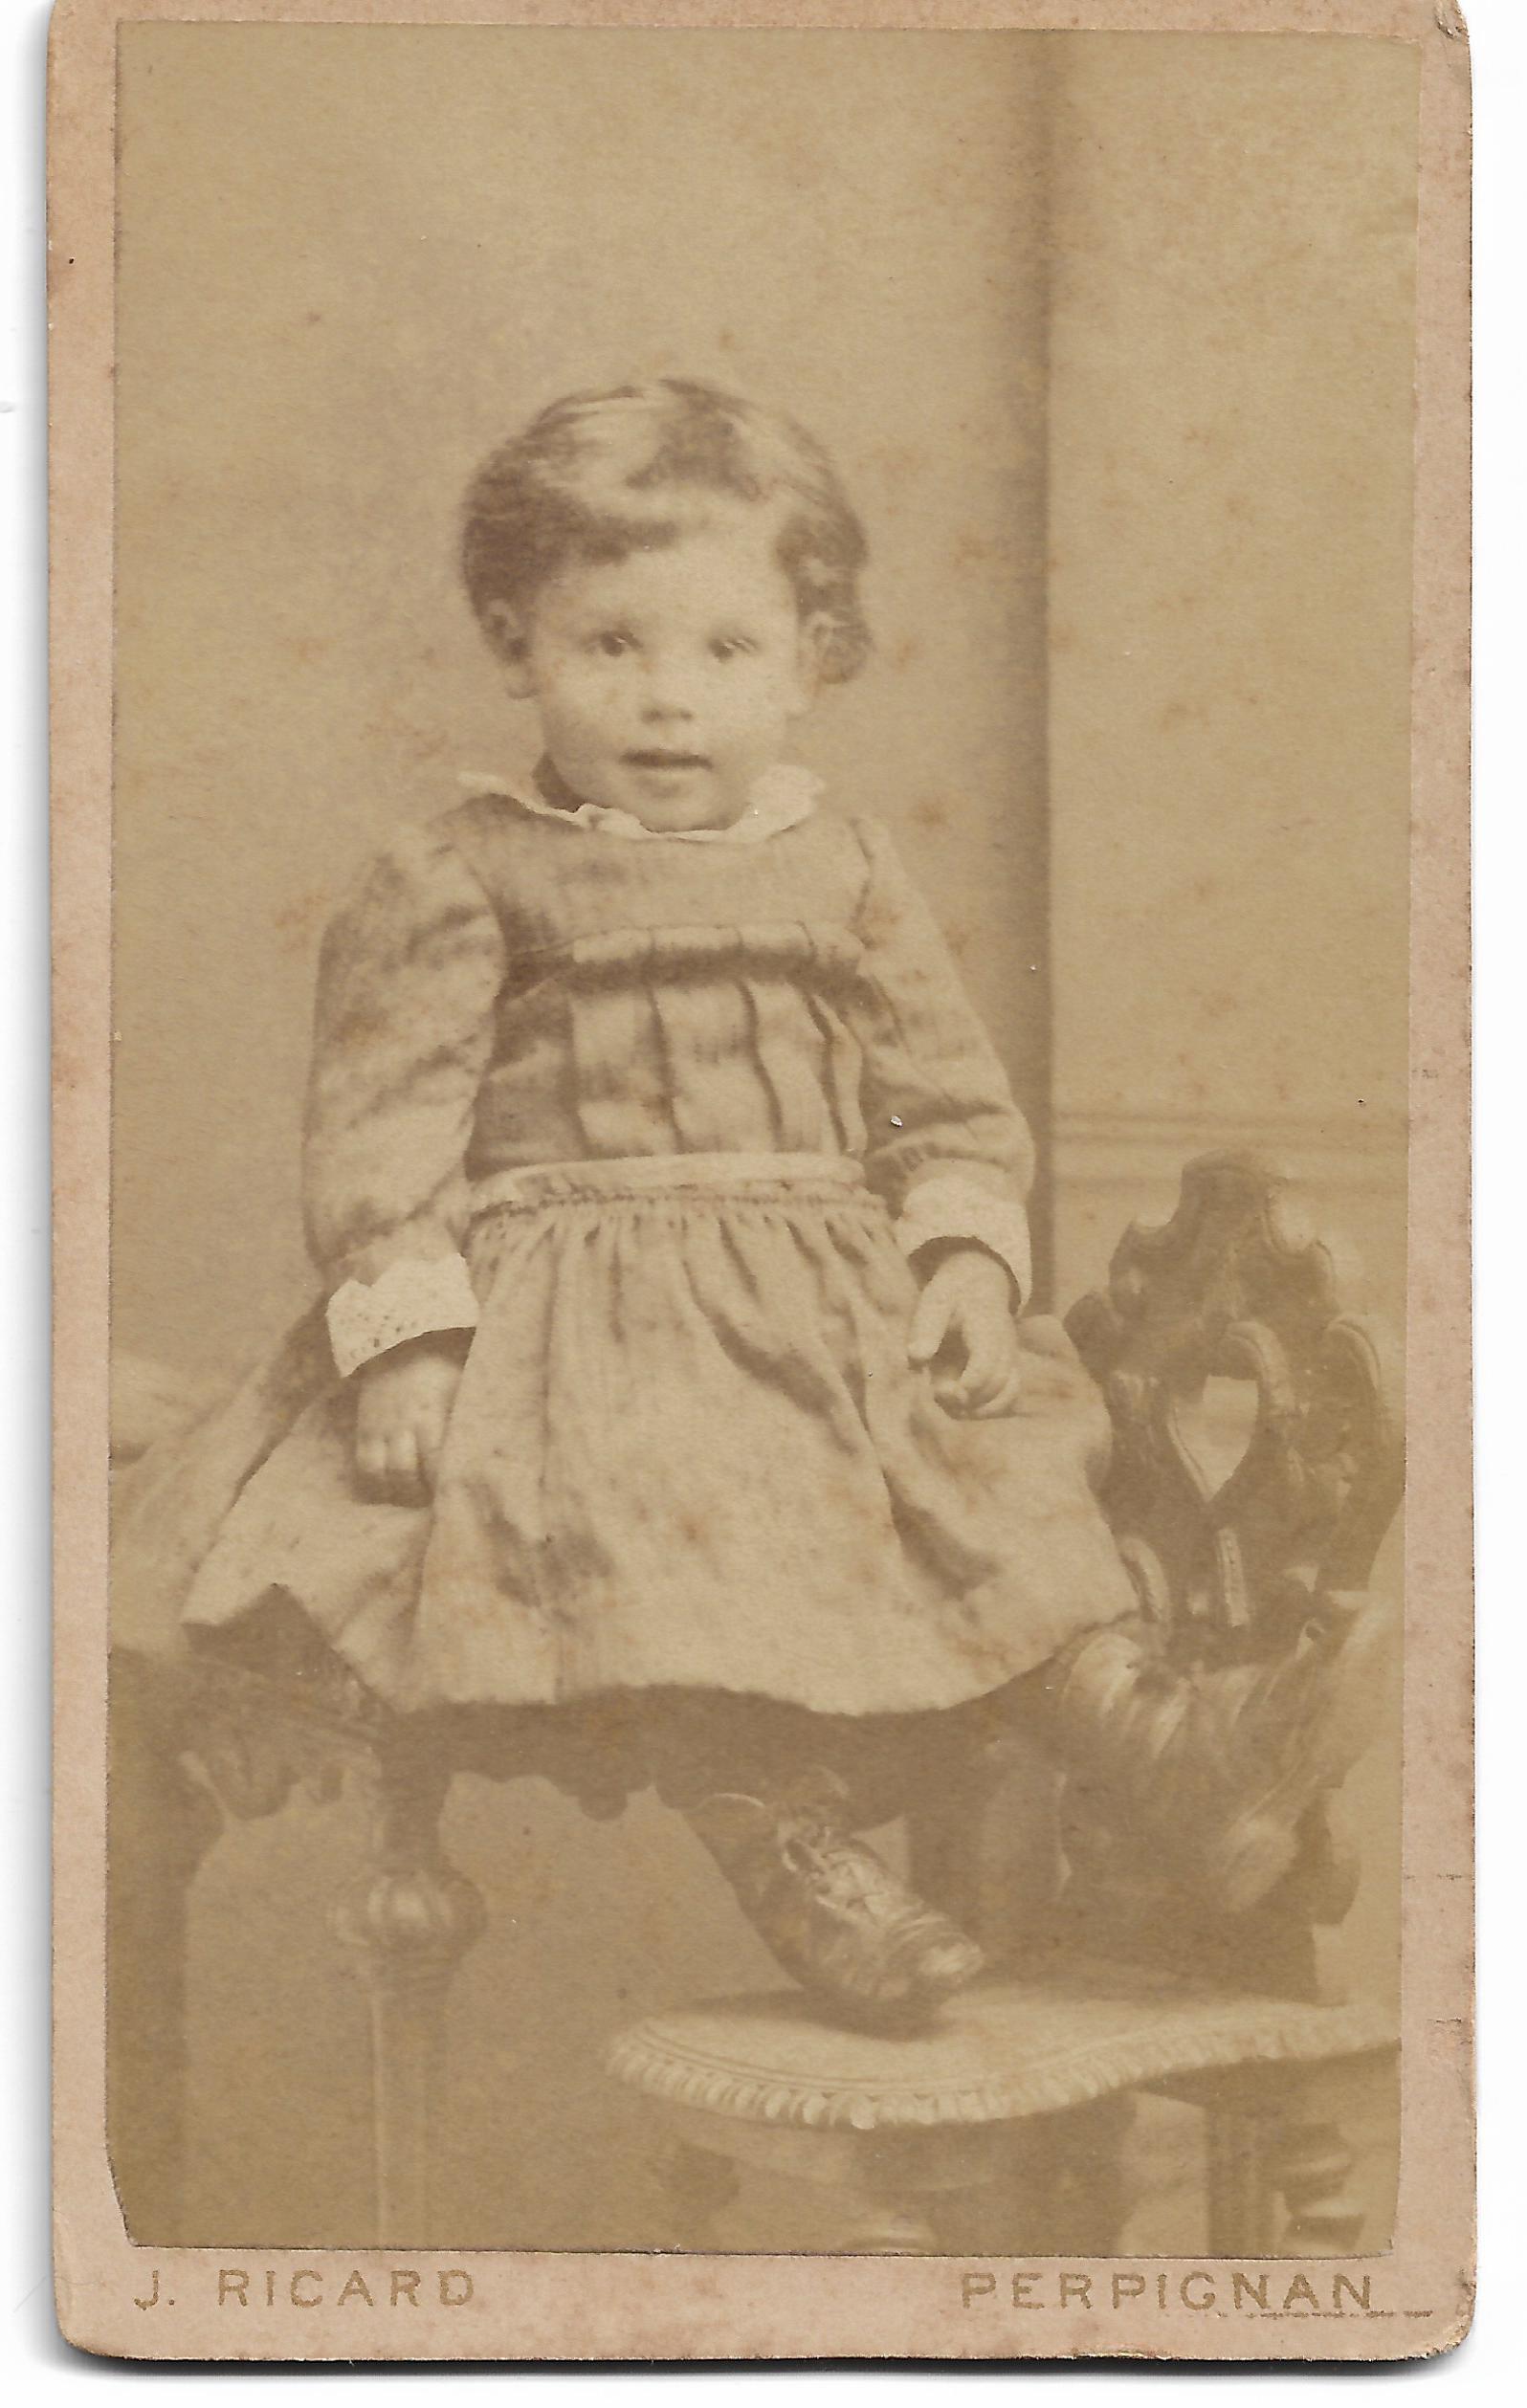 portrait d enfant ricard photographe perpignan vers 1880 institut du grenat. Black Bedroom Furniture Sets. Home Design Ideas